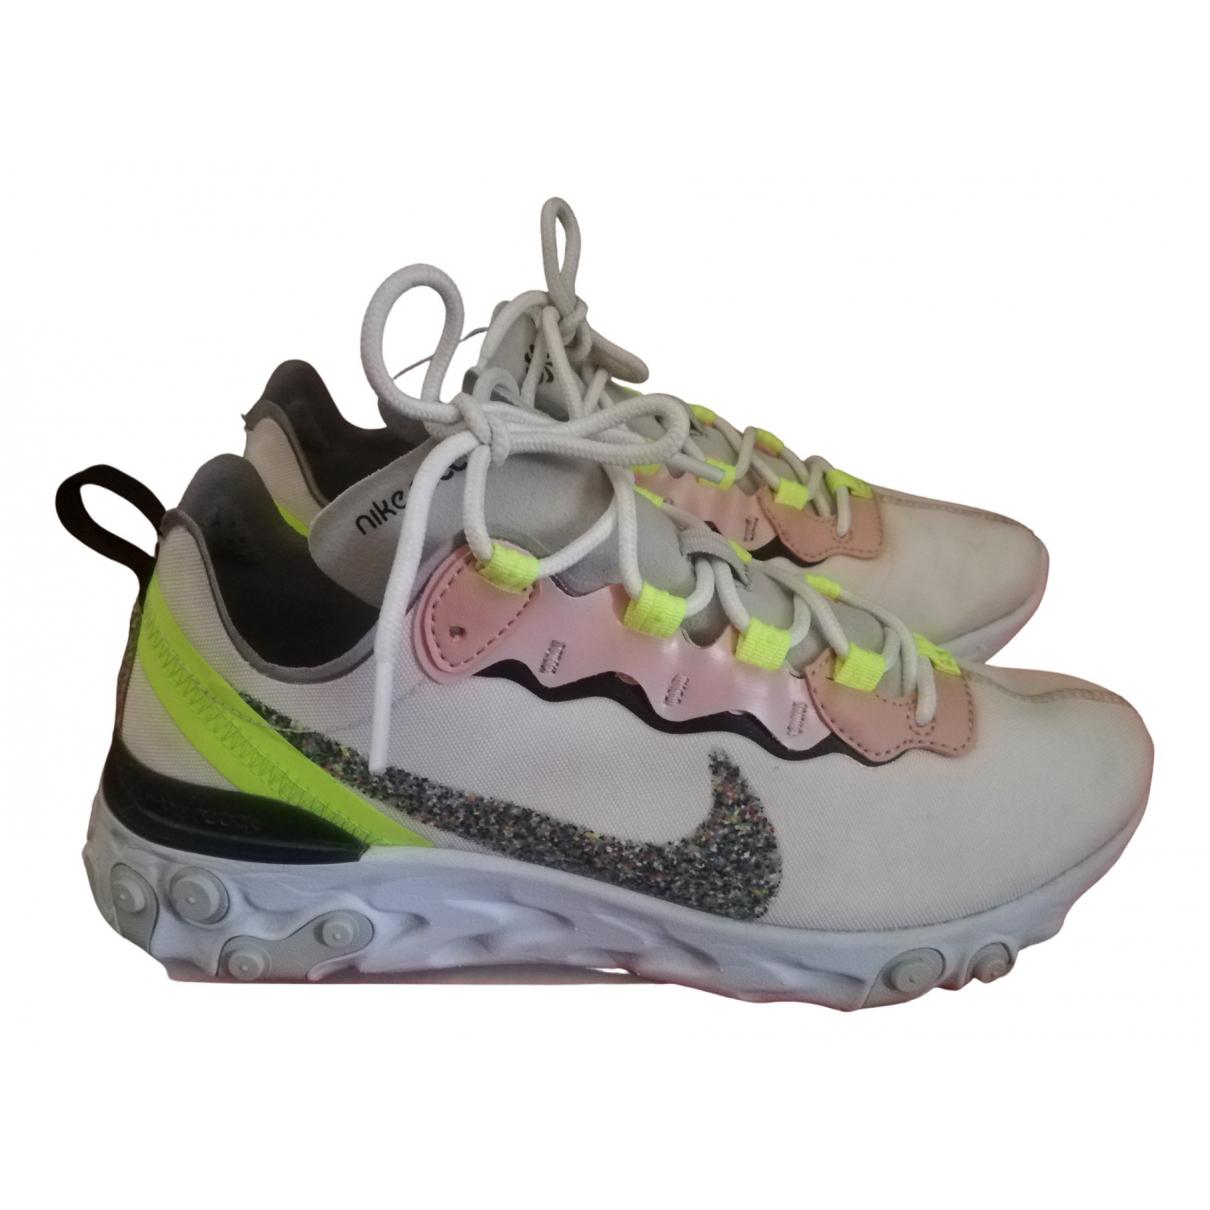 Deportivas React element 55 Nike